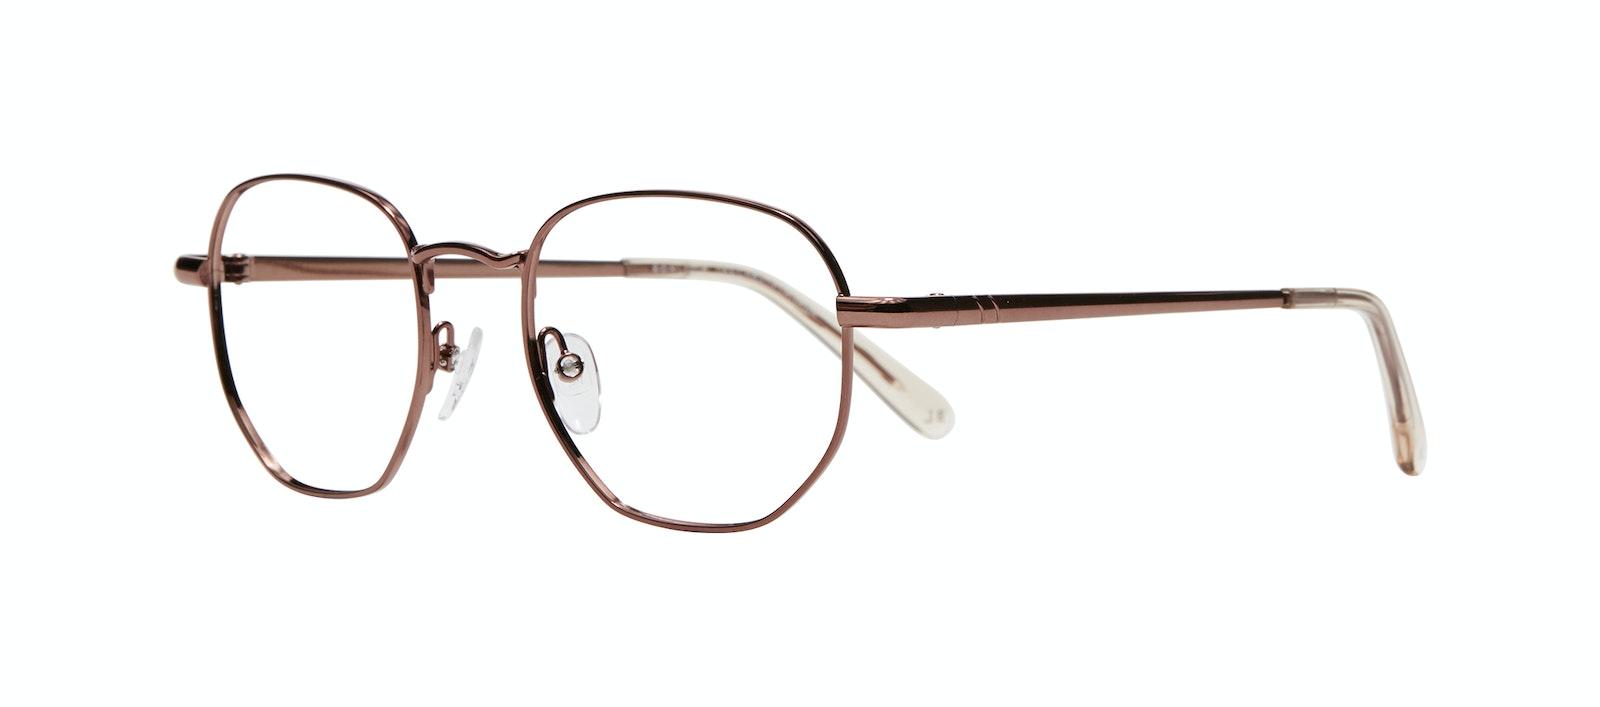 Affordable Fashion Glasses Round Eyeglasses Men Women Aura Copper Tilt